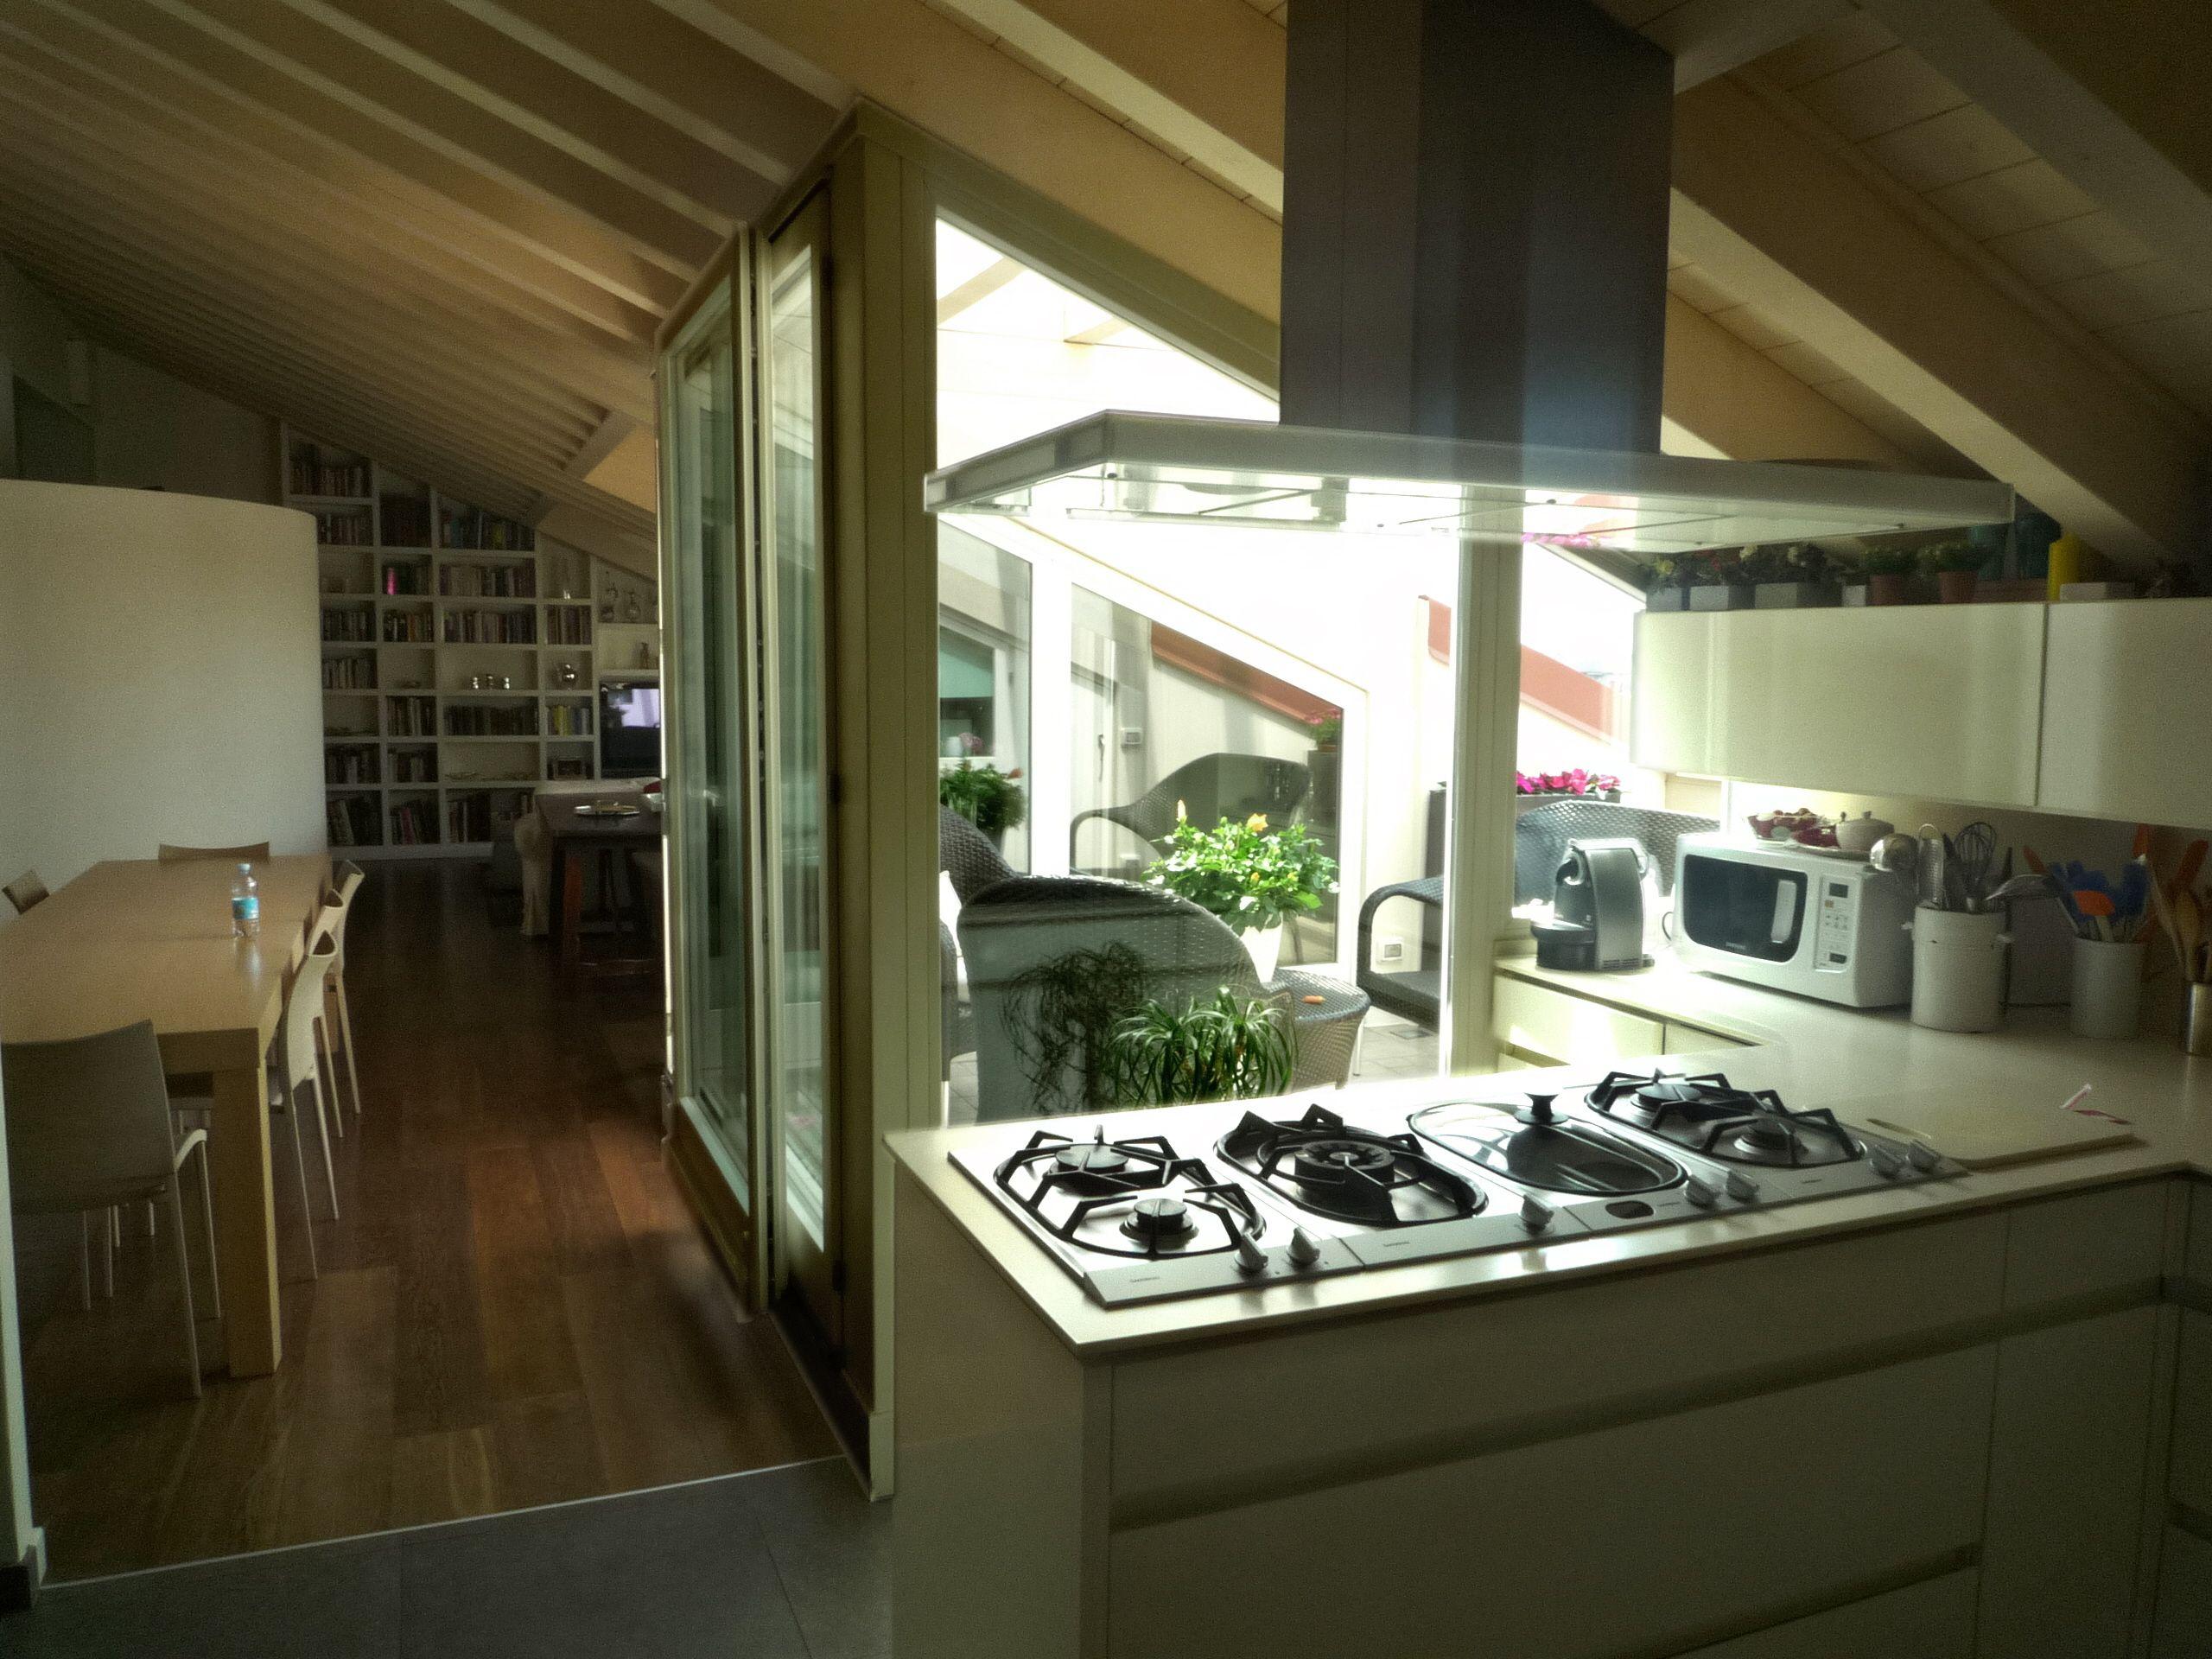 Attico mansarda con terrazzo giardino d 39 inverno - Giardino d inverno in terrazza ...